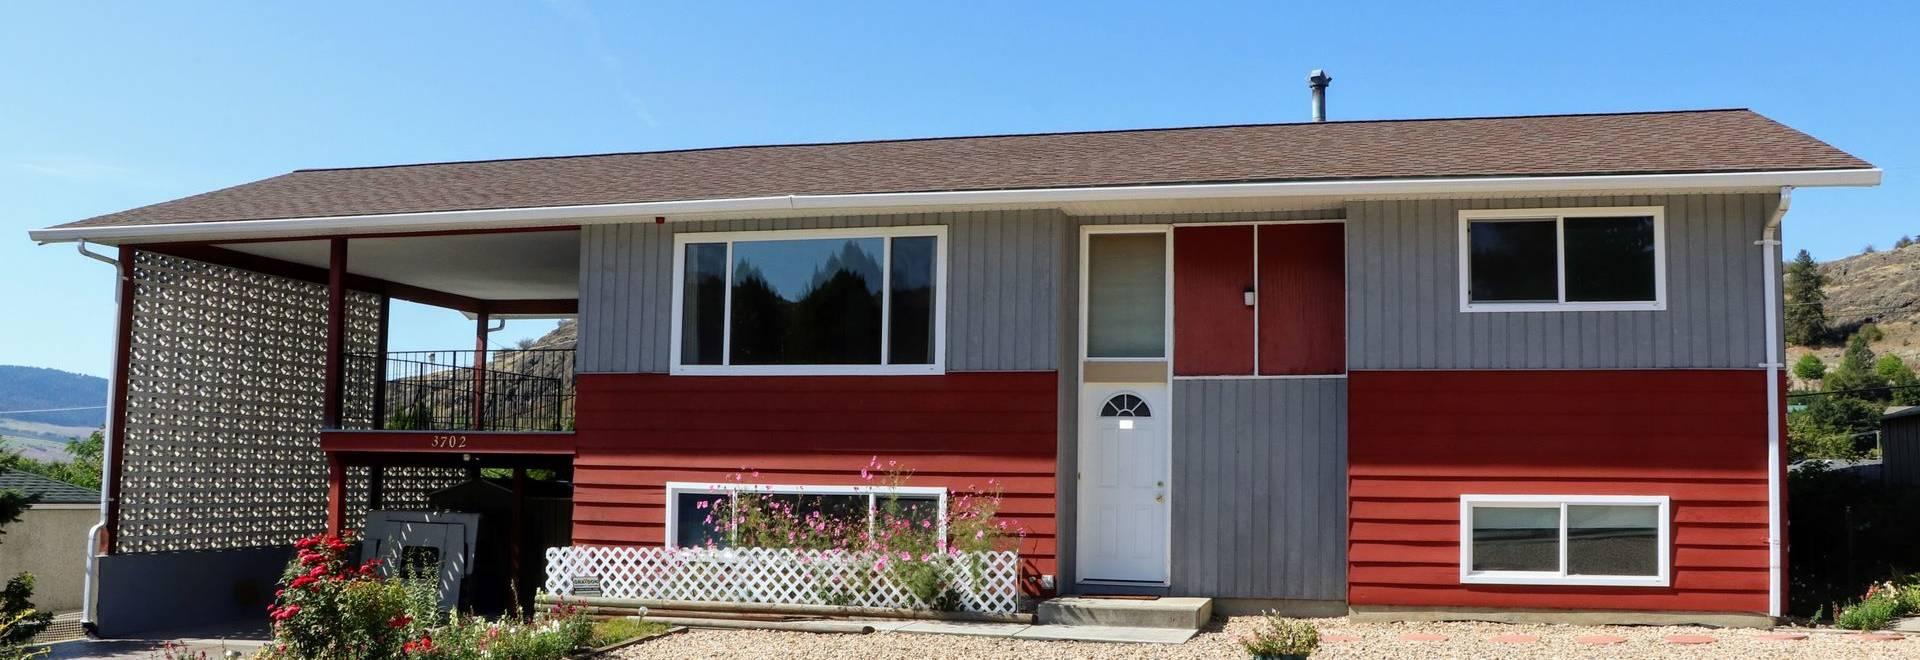 3702 36 Street, Vernon, BC